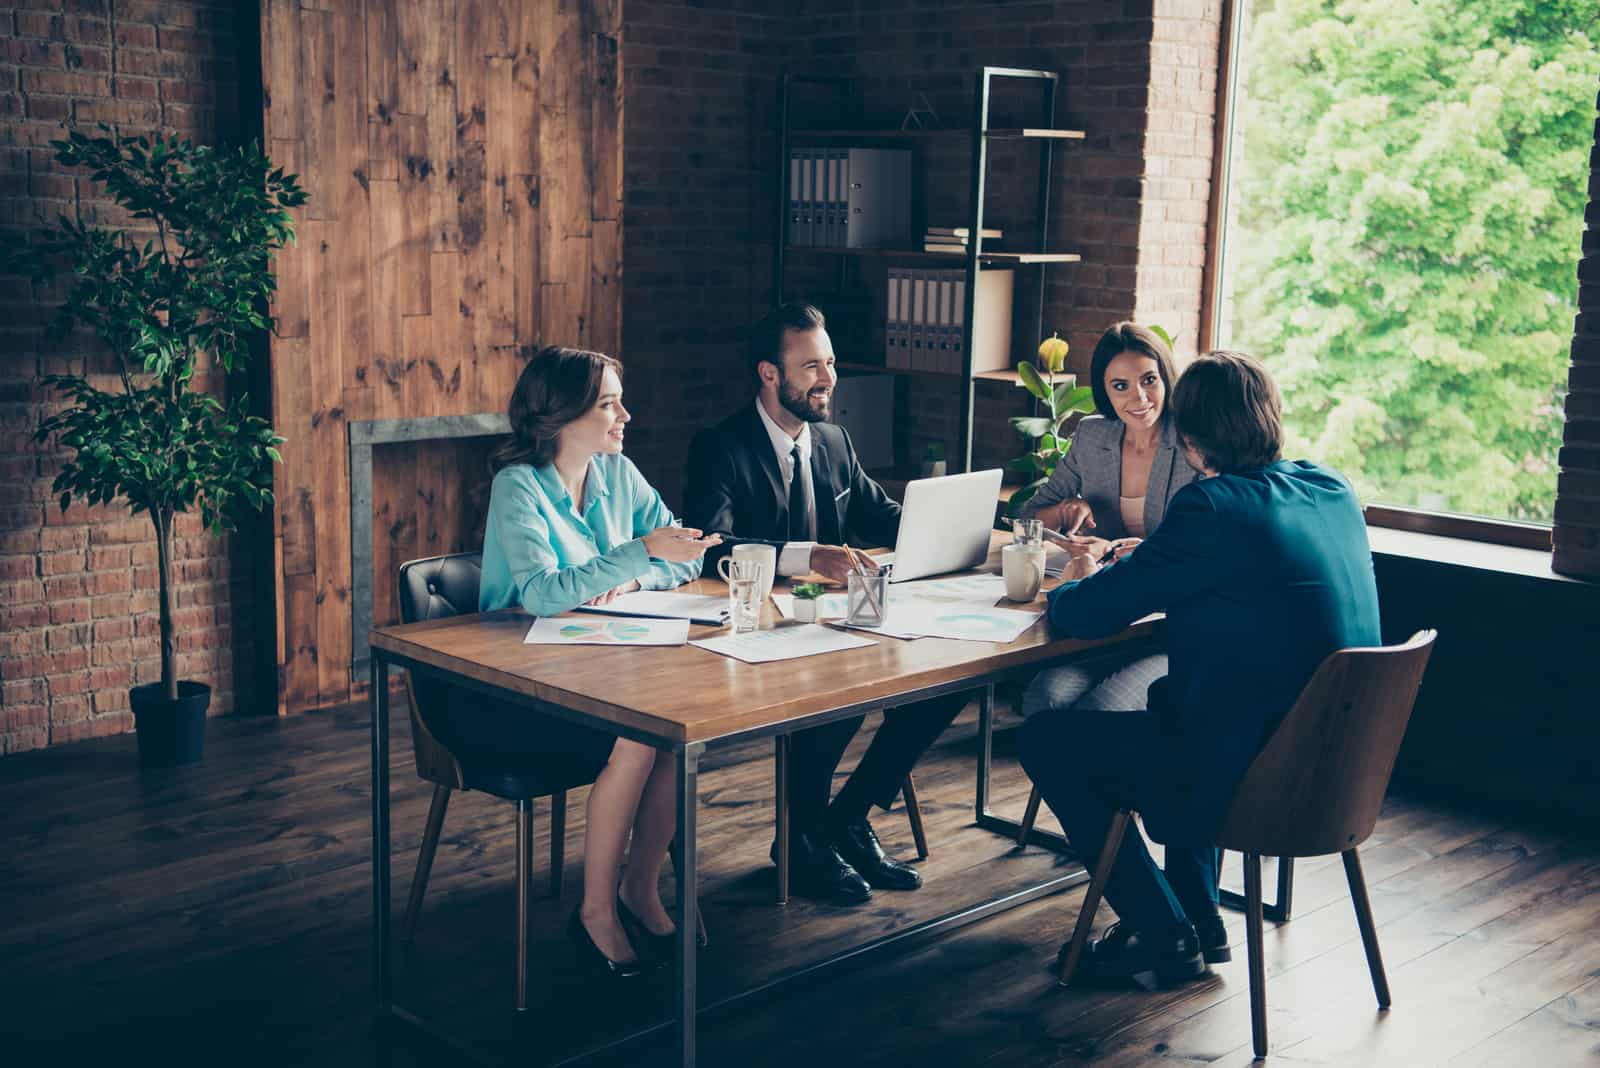 real estate team sitting on table